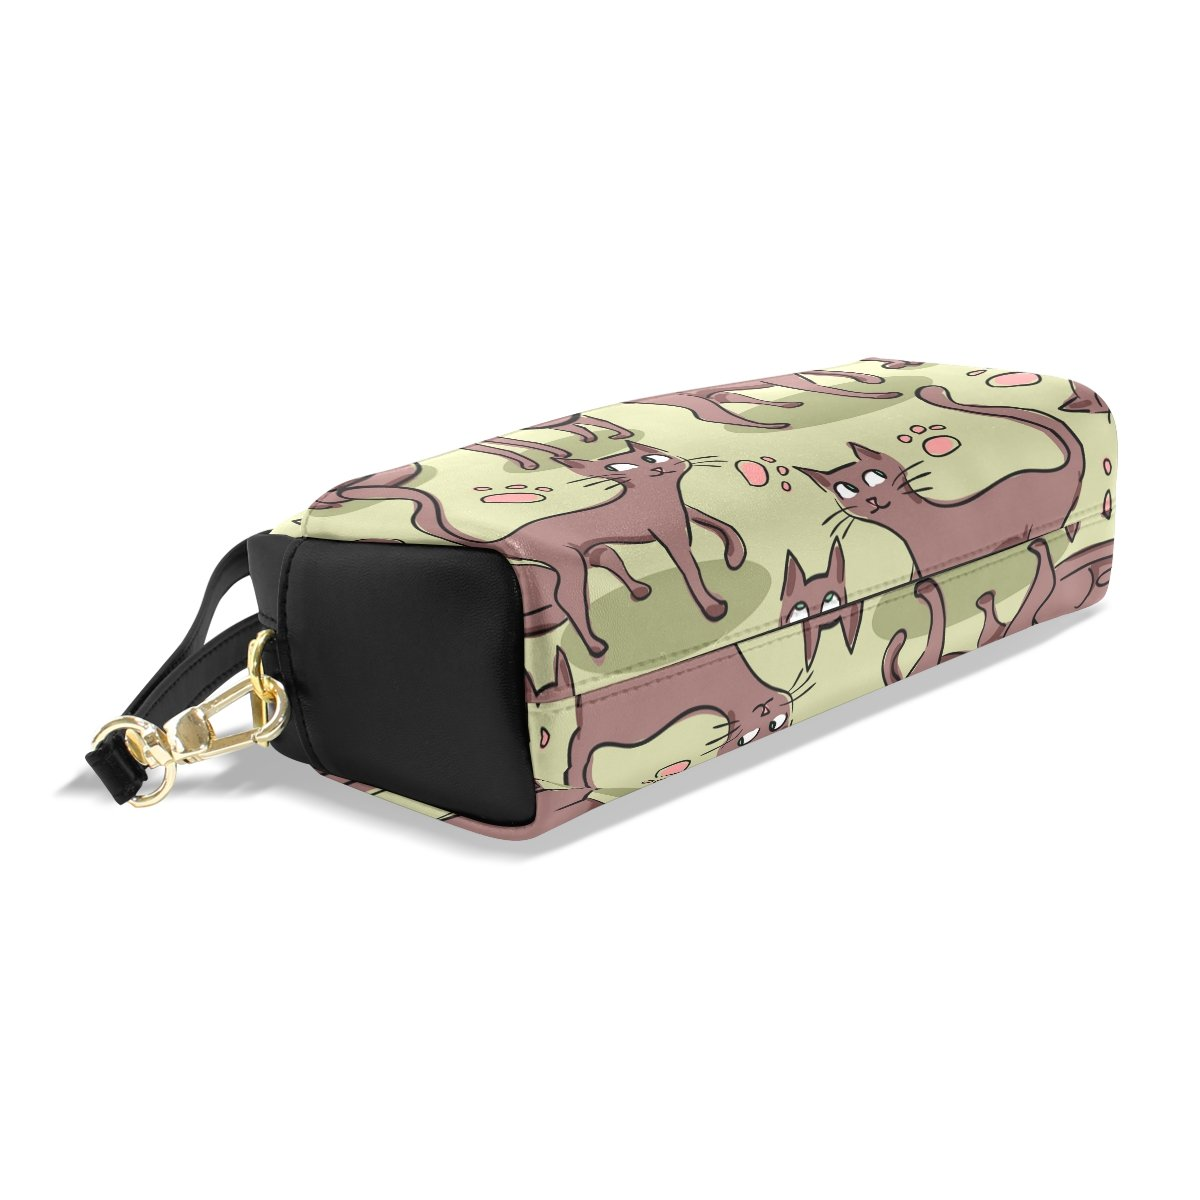 BENNIGIRY Nahtloses Muster mit netten Katzen Bleistift Fall tragbar Pen Pen Pen Tasche Student Schreibwaren Pouch PU Leder Groß Kapazität Reißverschluss Make-up Kosmetiktasche B07BF5QNYP | Reparieren  6ddba9